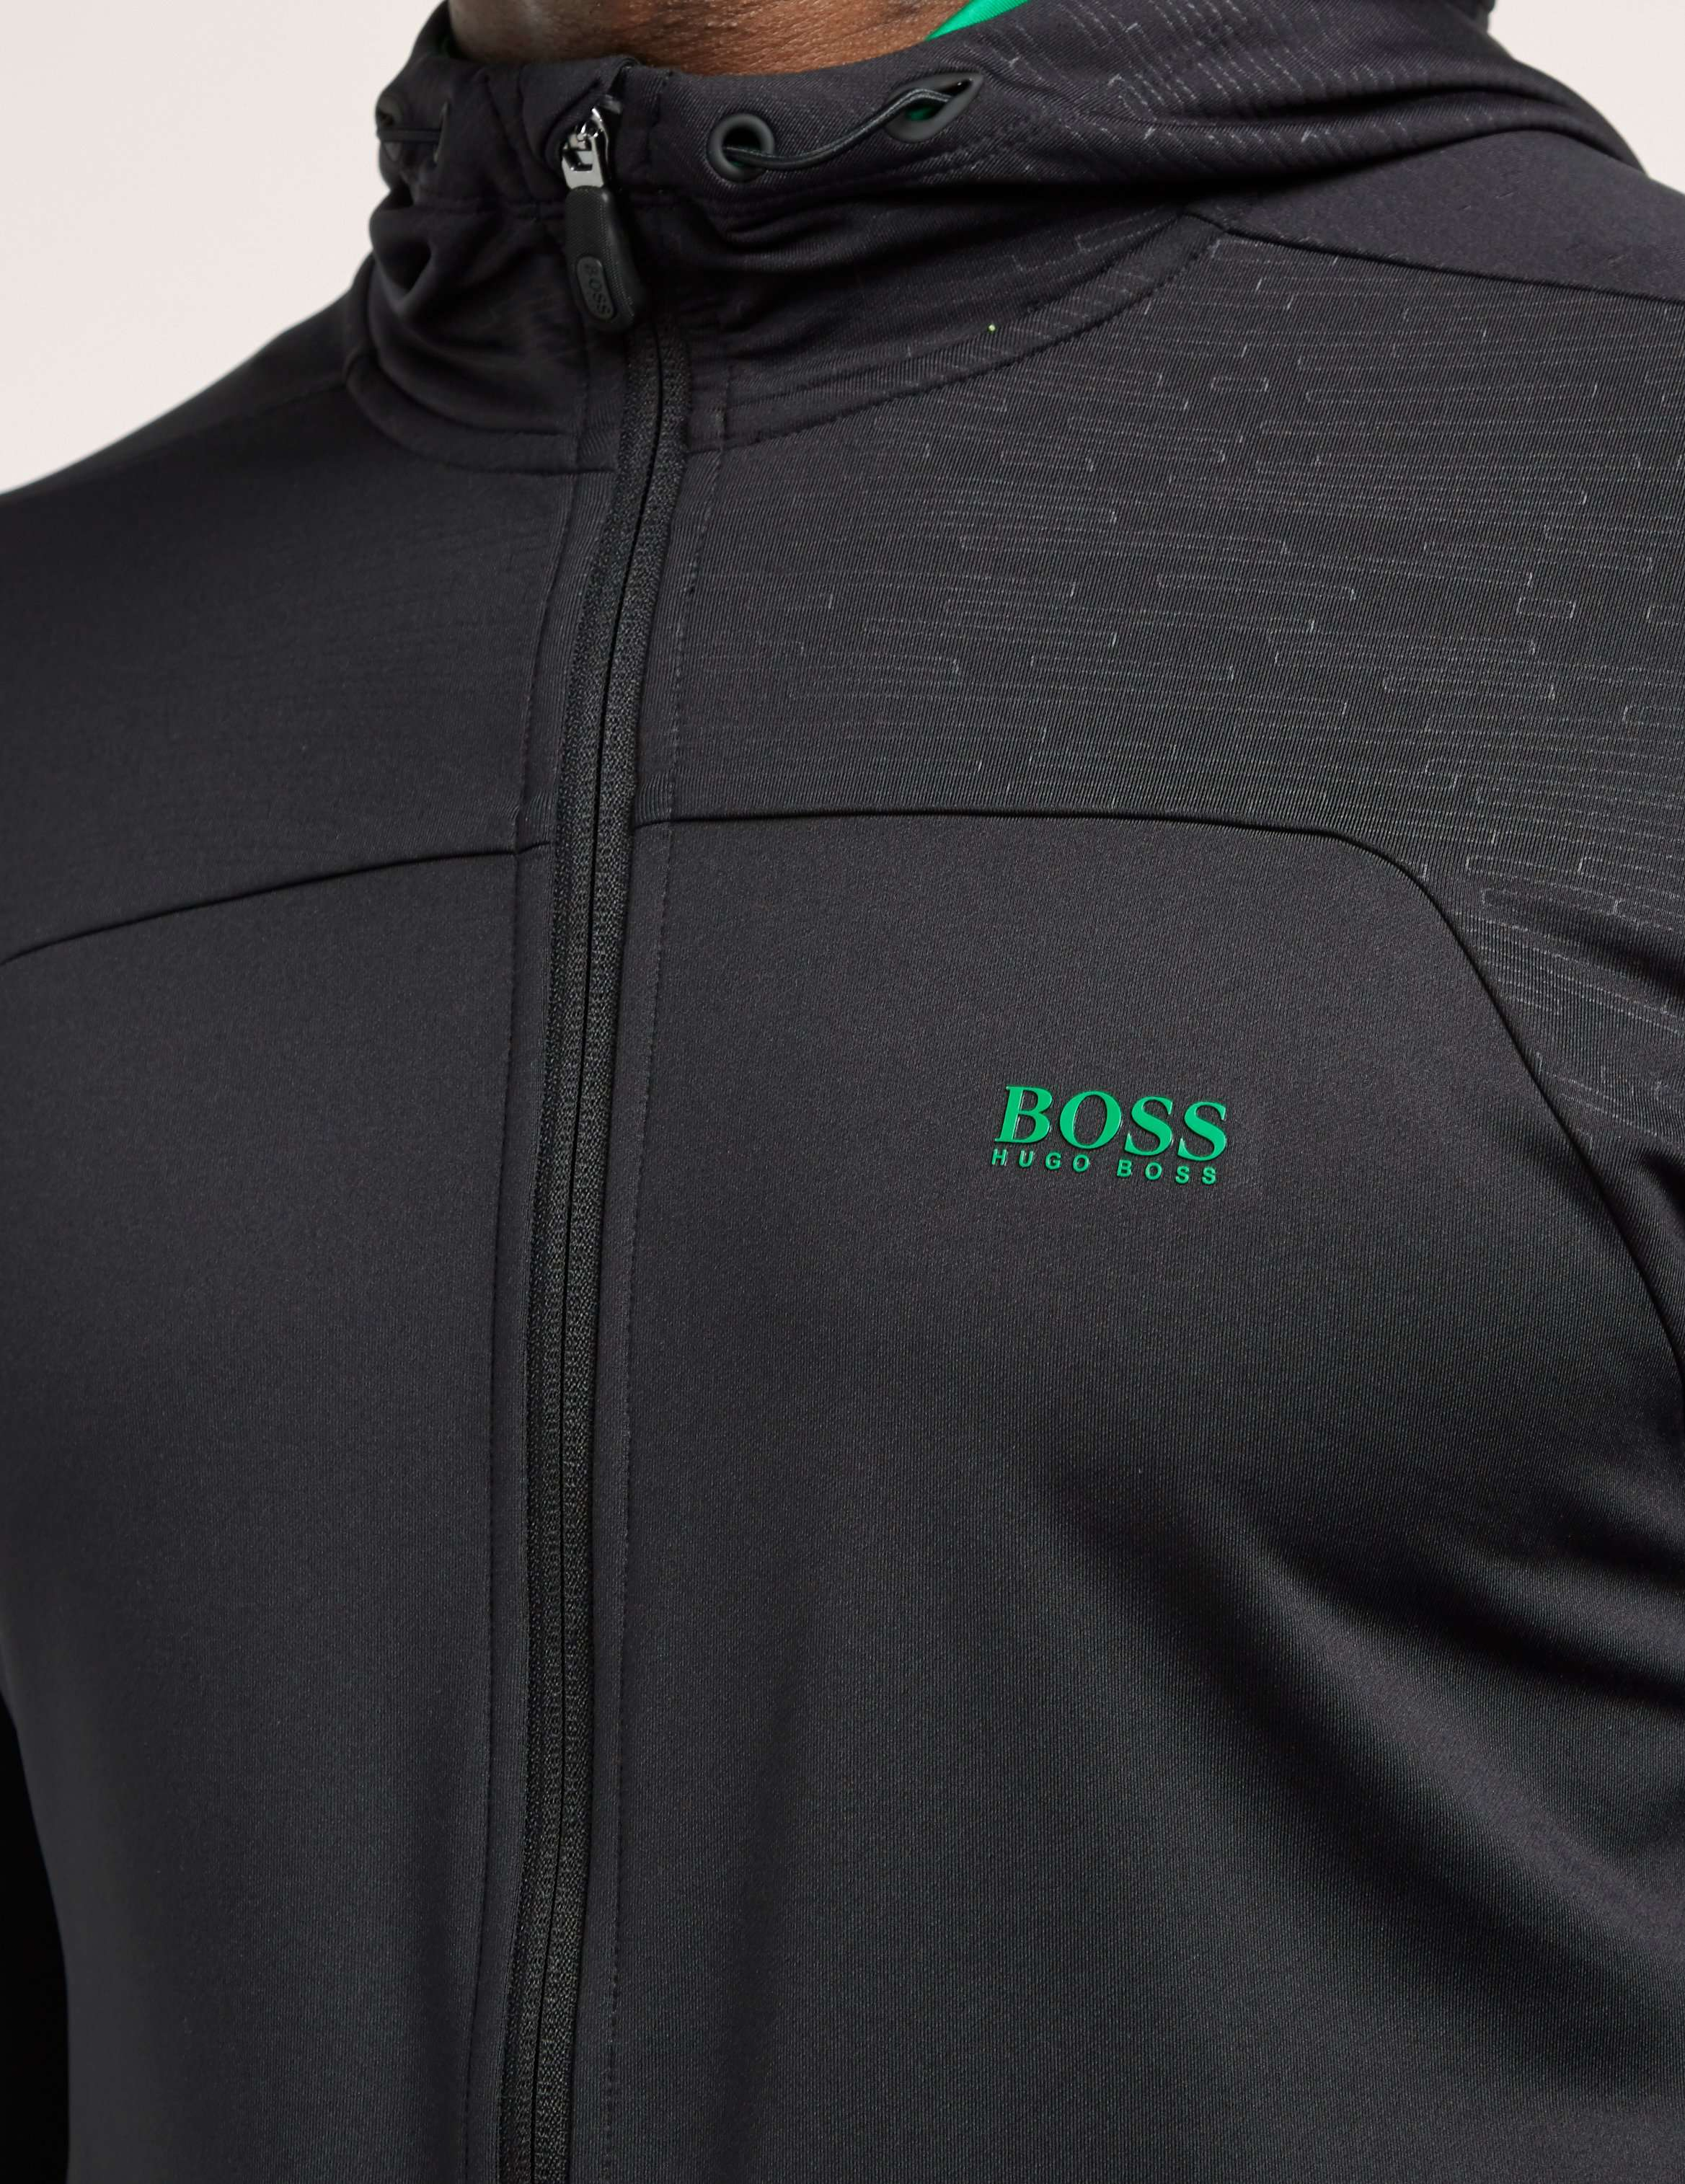 BOSS Green Saggy Zip Up Hoody